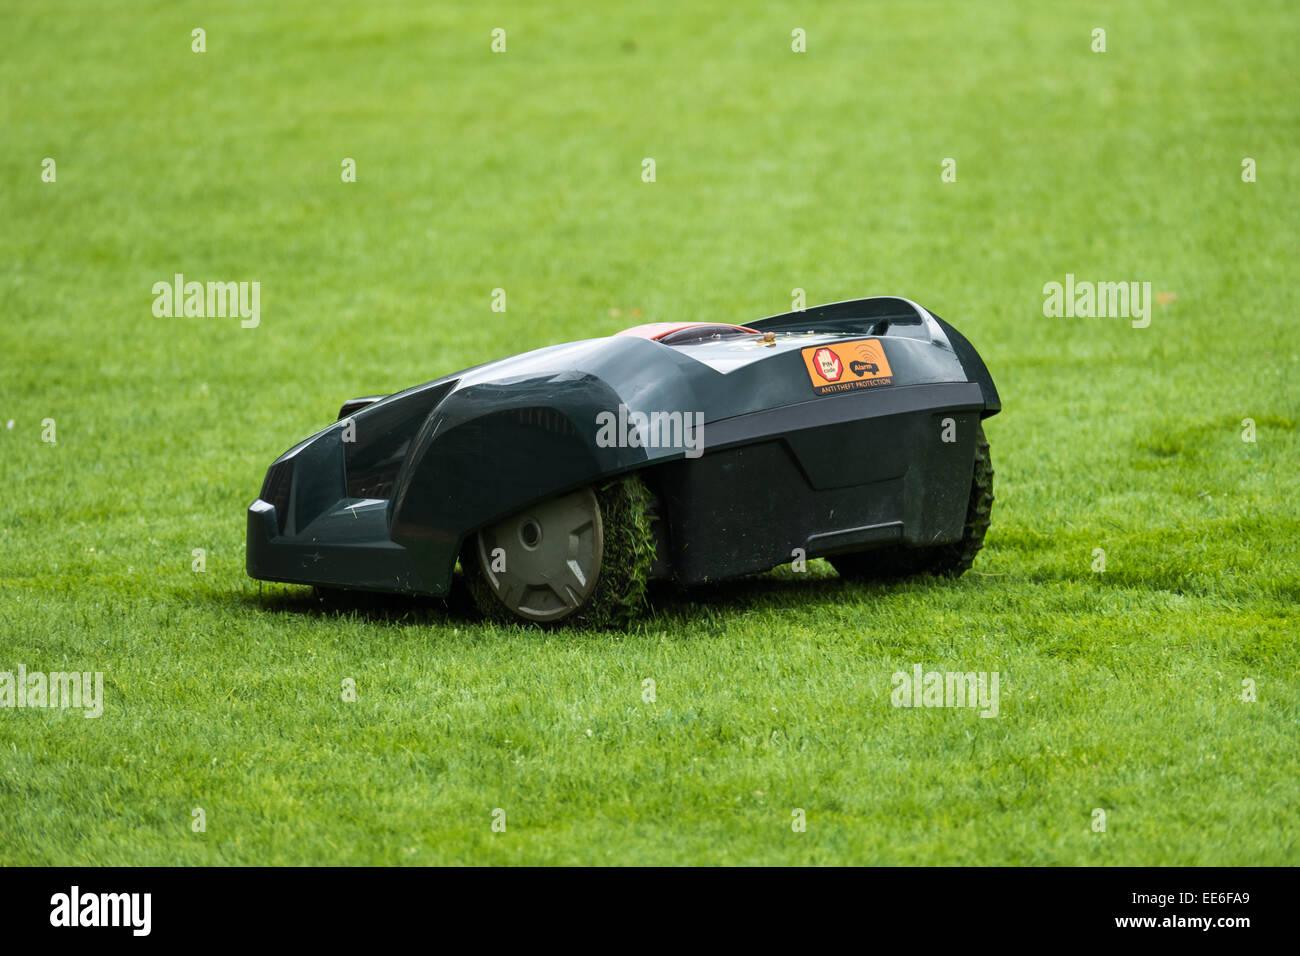 Lawn Mower Robot Stock Photo